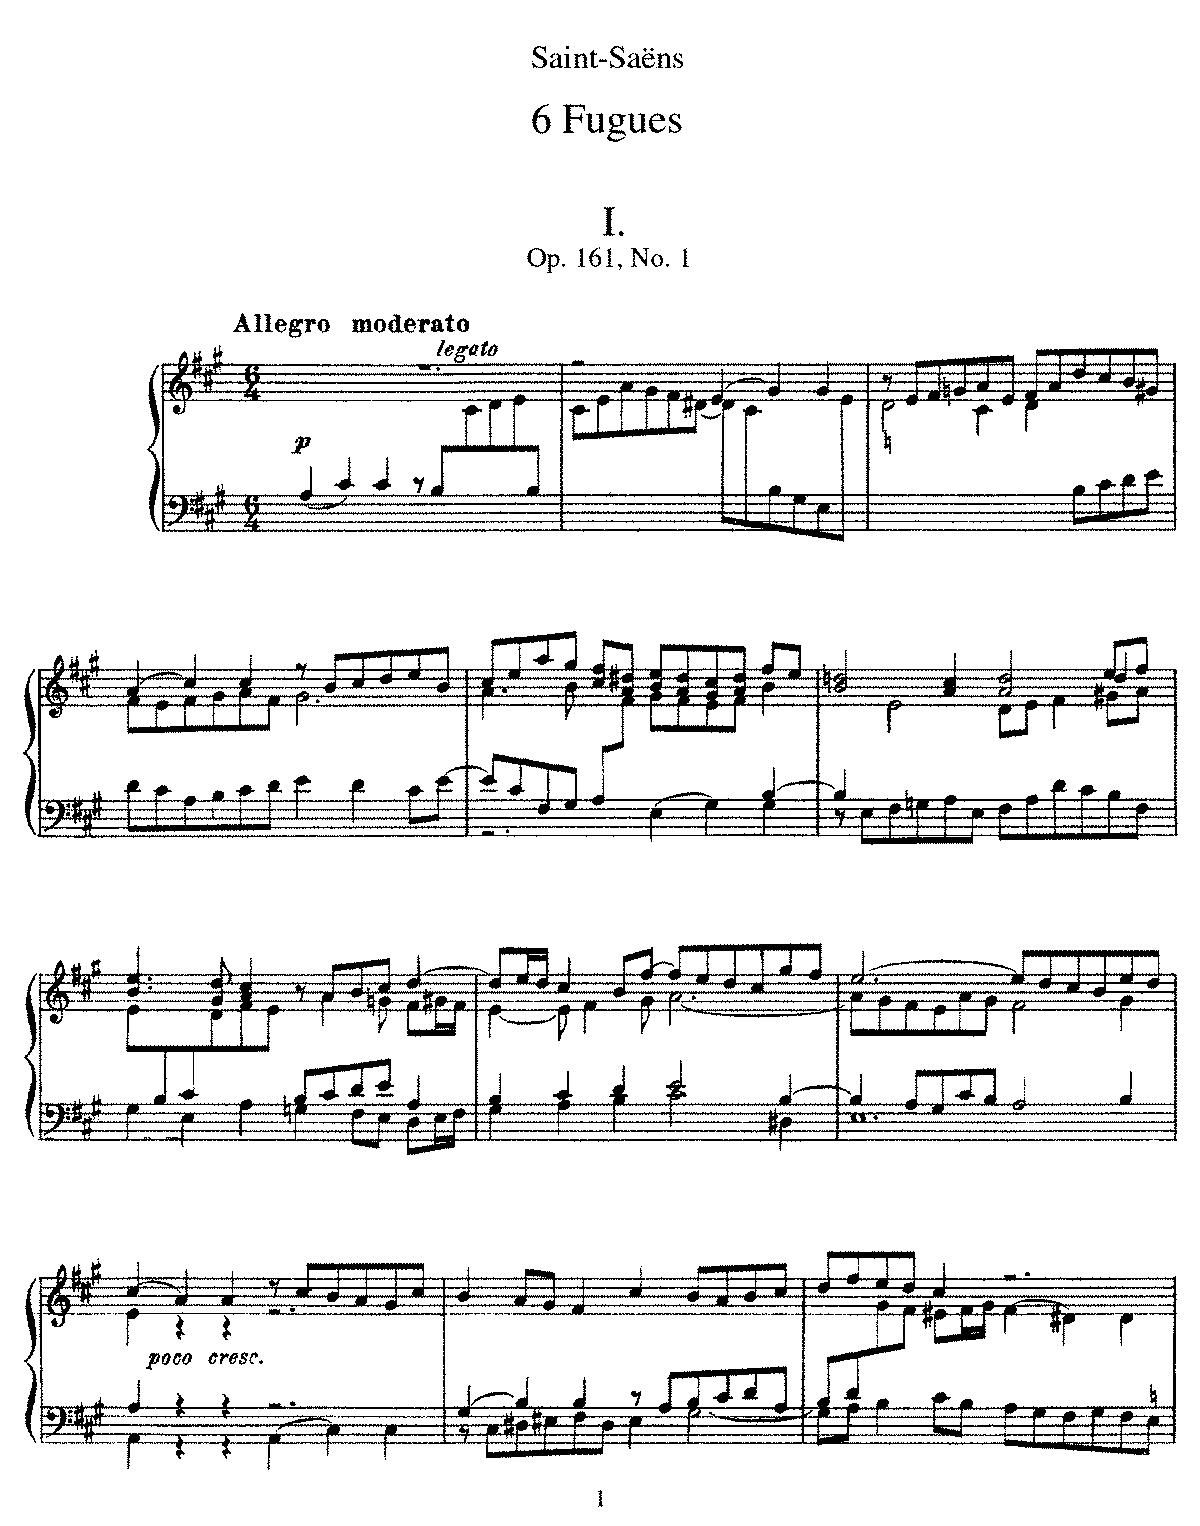 6 Fugues, Op 161 (Saint-Saëns, Camille) - IMSLP/Petrucci Music